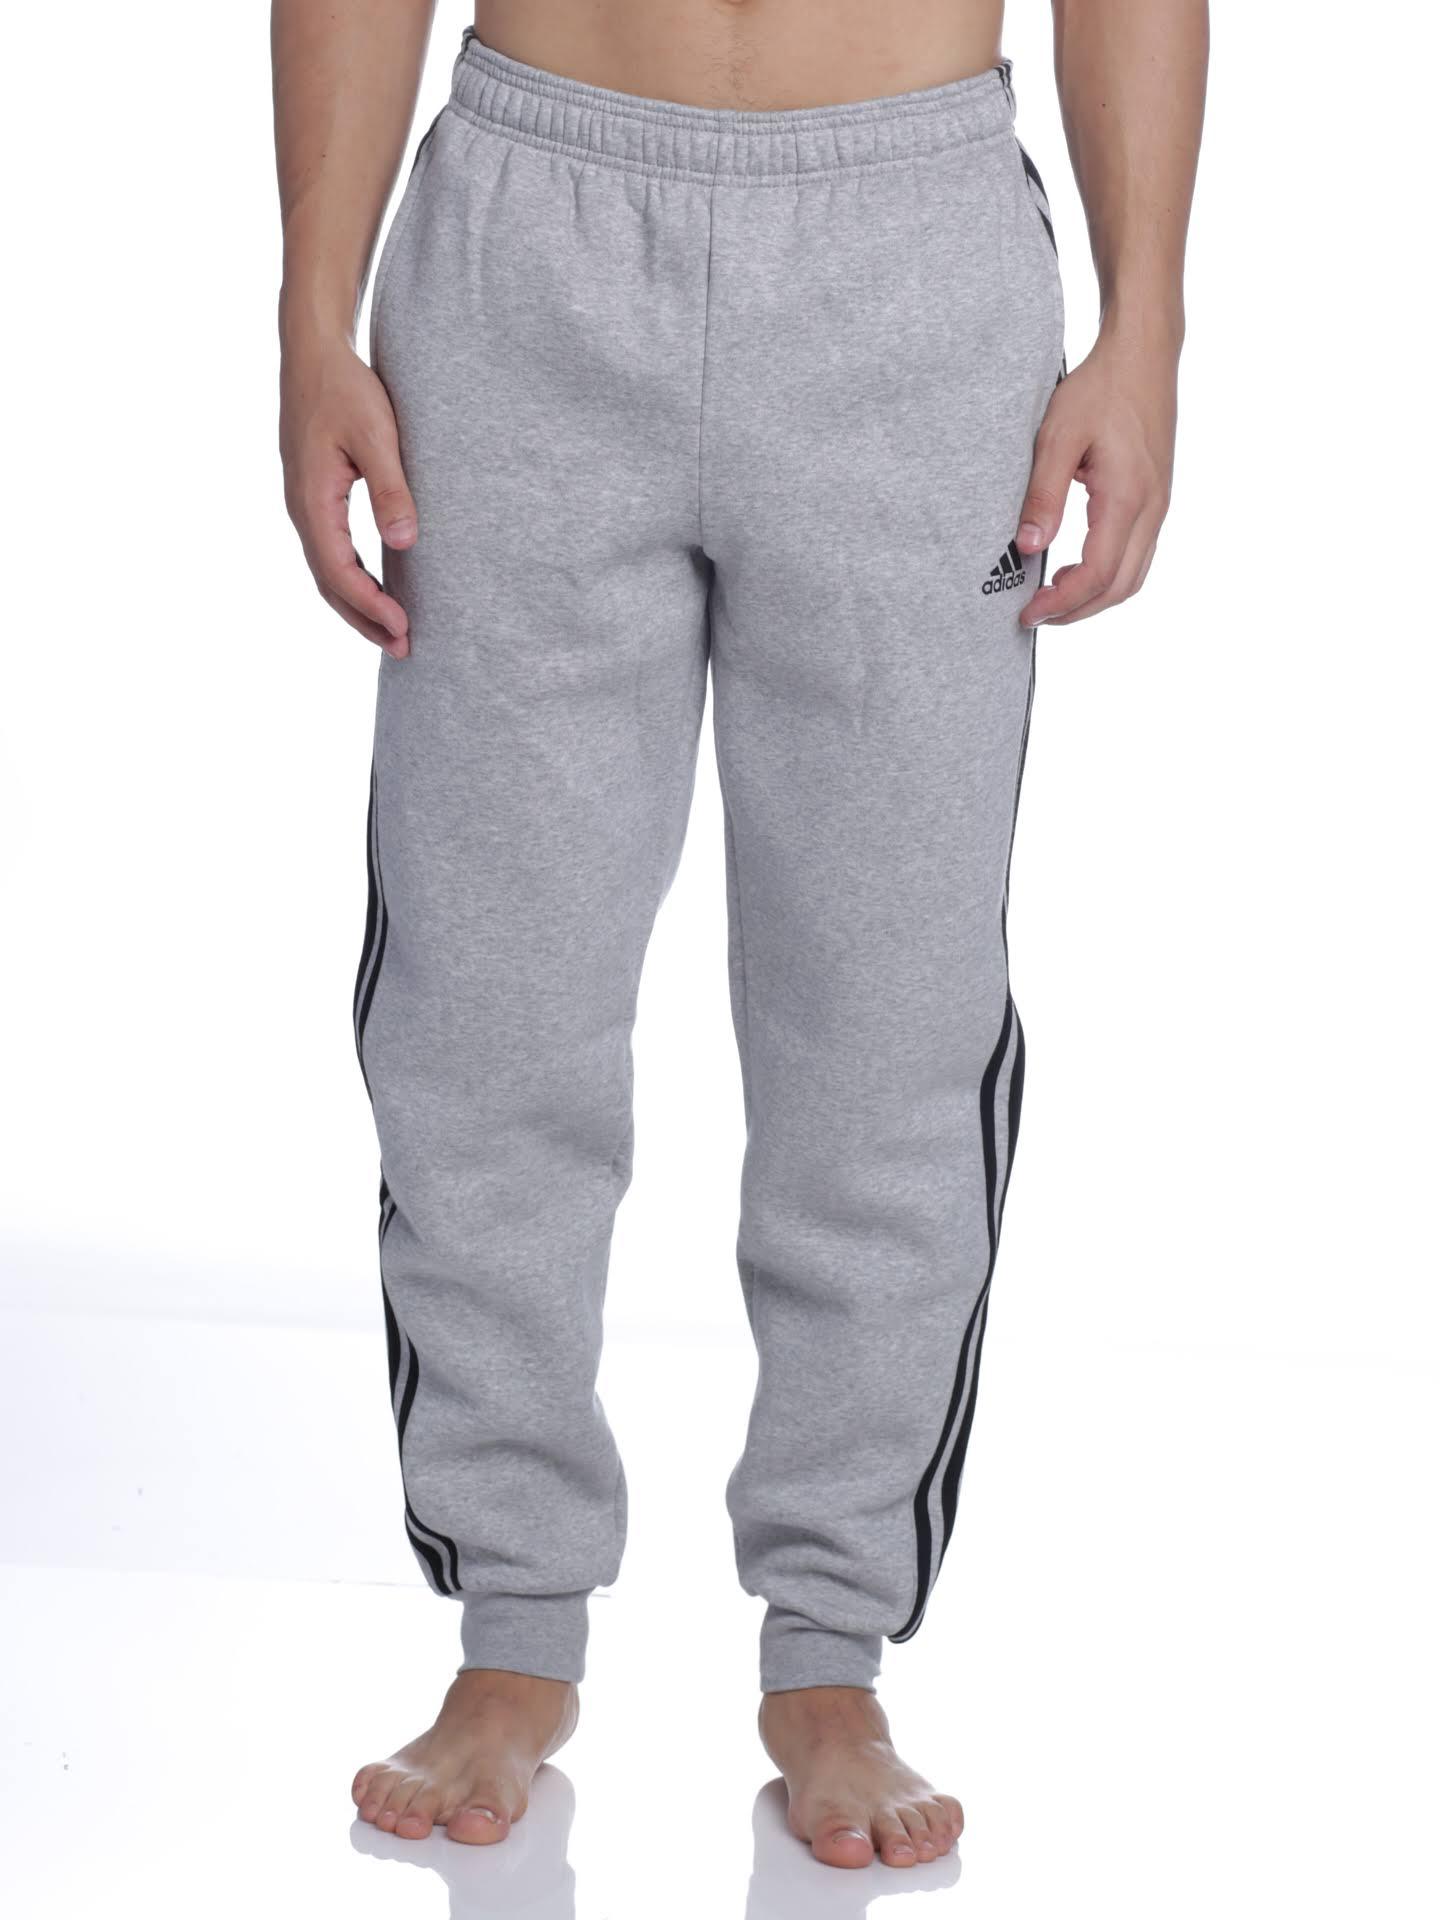 Pants Jaspeado Ce9492035 Gris 3 Fleece Hombre Stripe Essential Adidas Negro Athletics pBqnwFBa